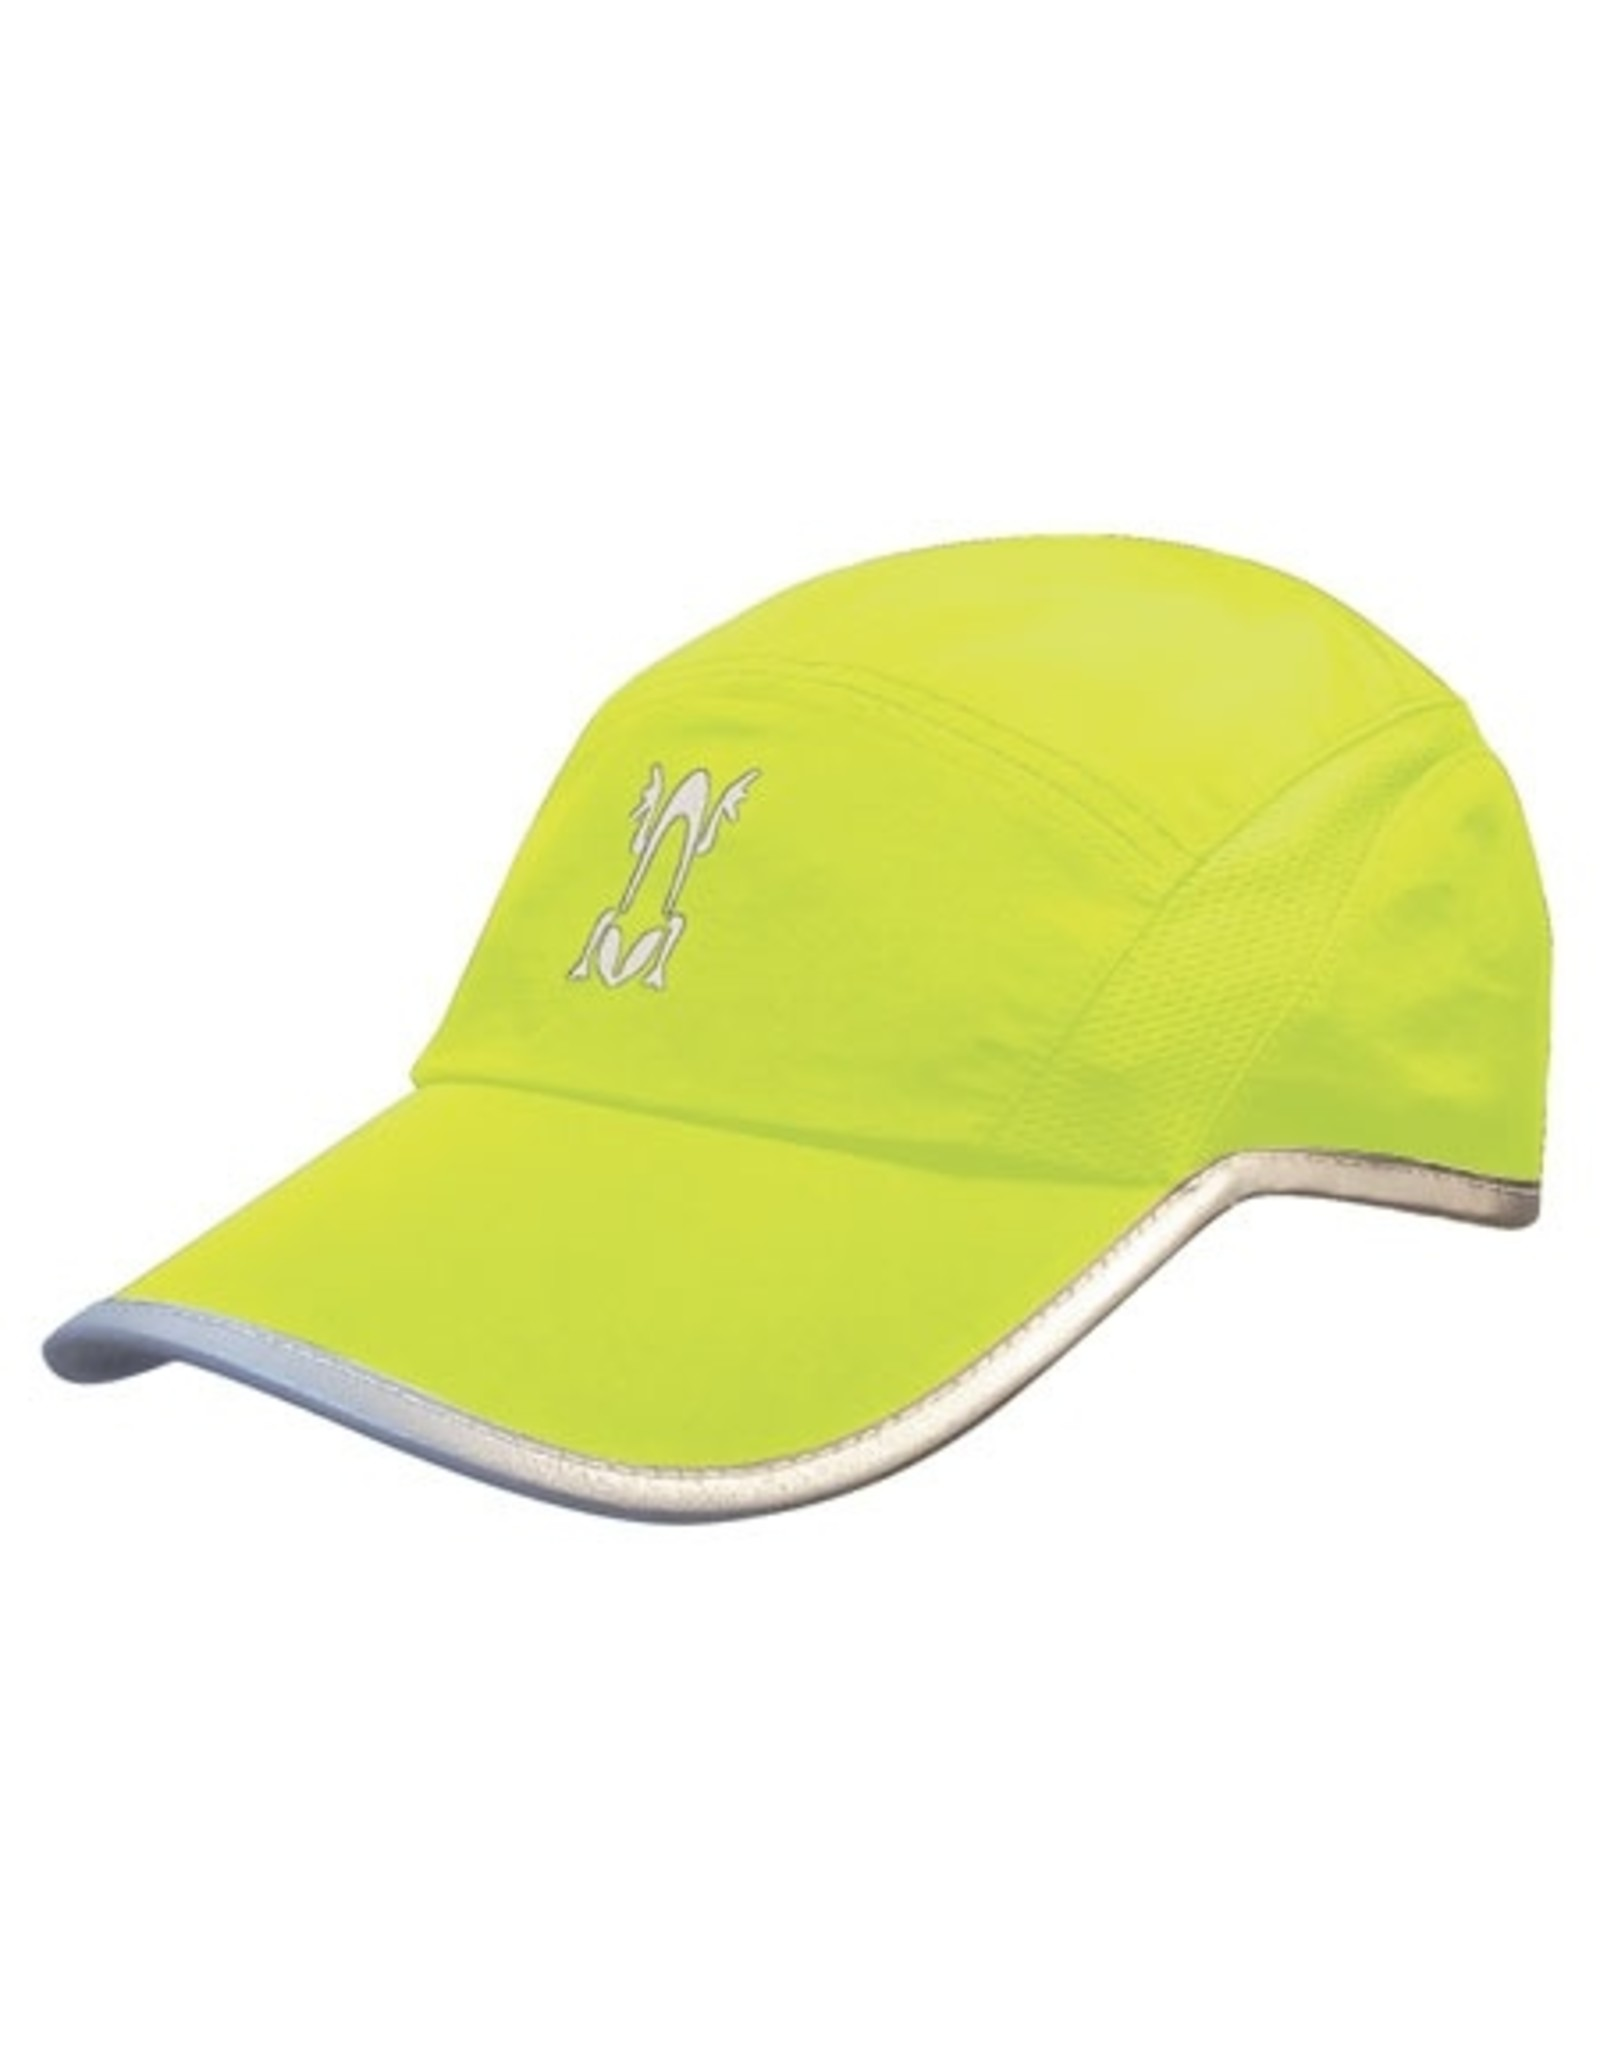 Amphipod AMPHIPOD 360 FULL-VIZ REF HAT (YELLOW)